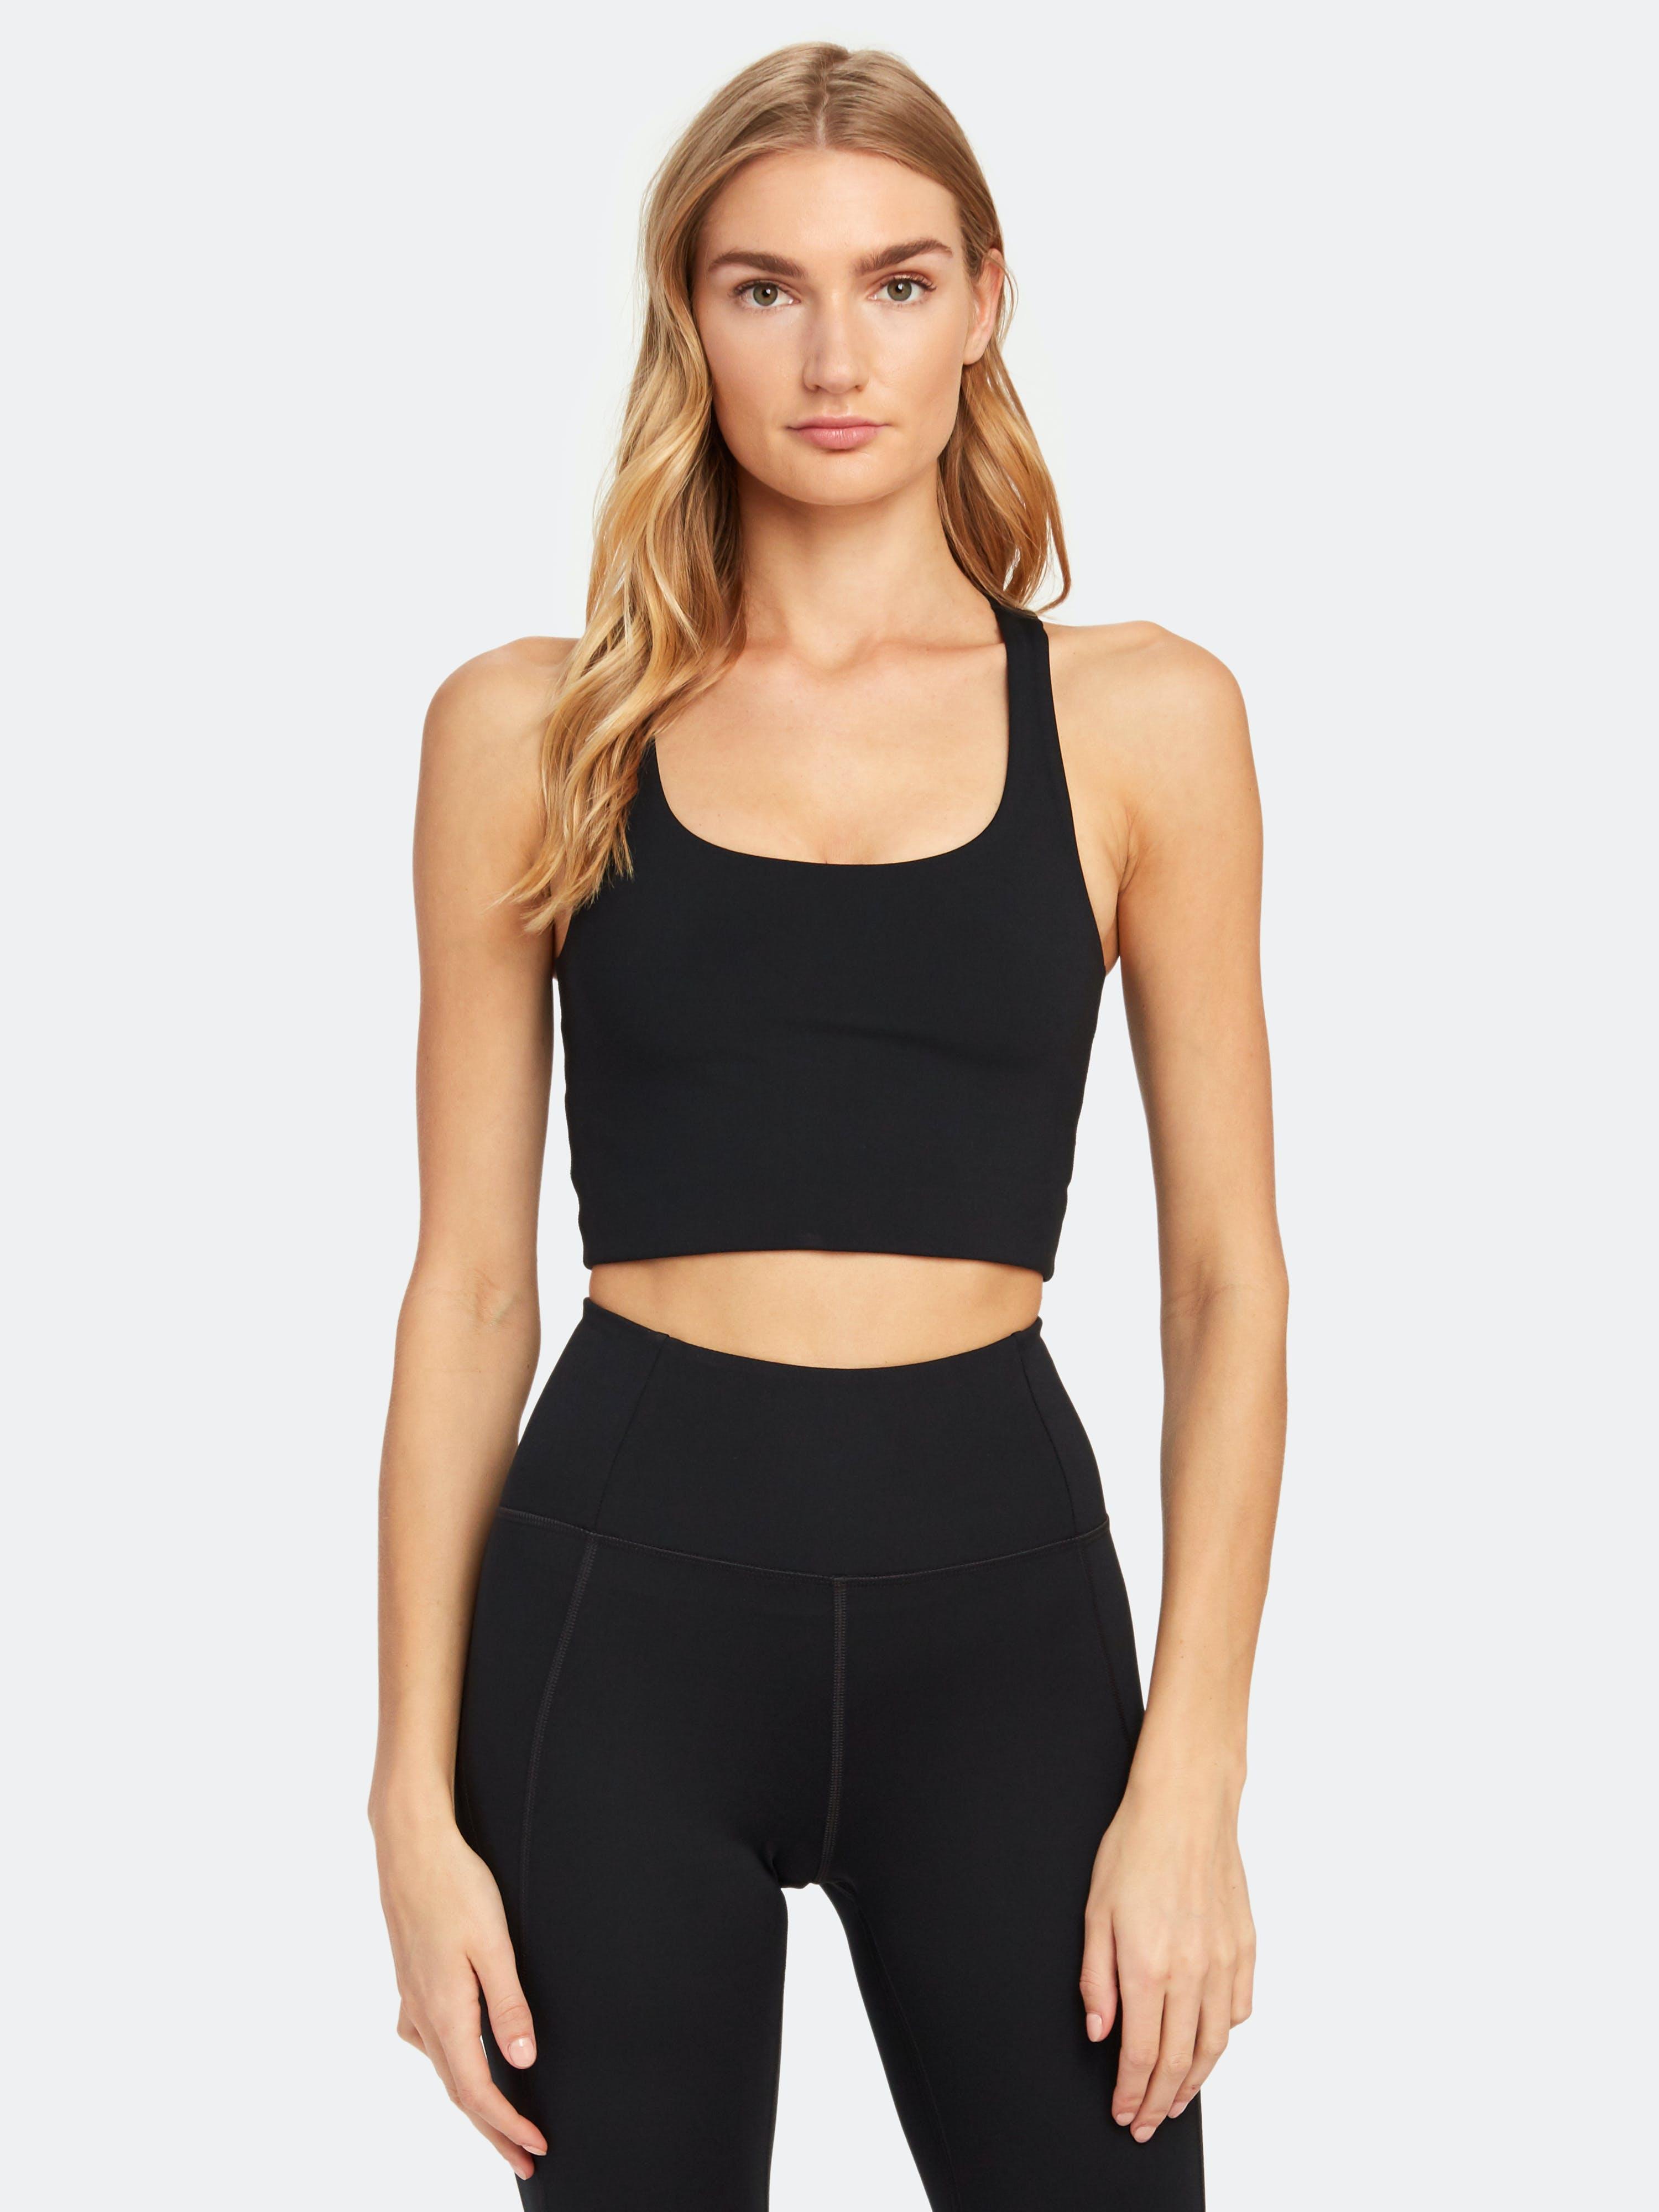 Girlfriend Collective Paloma Sports Bra - XL - Also in: XS  - Black